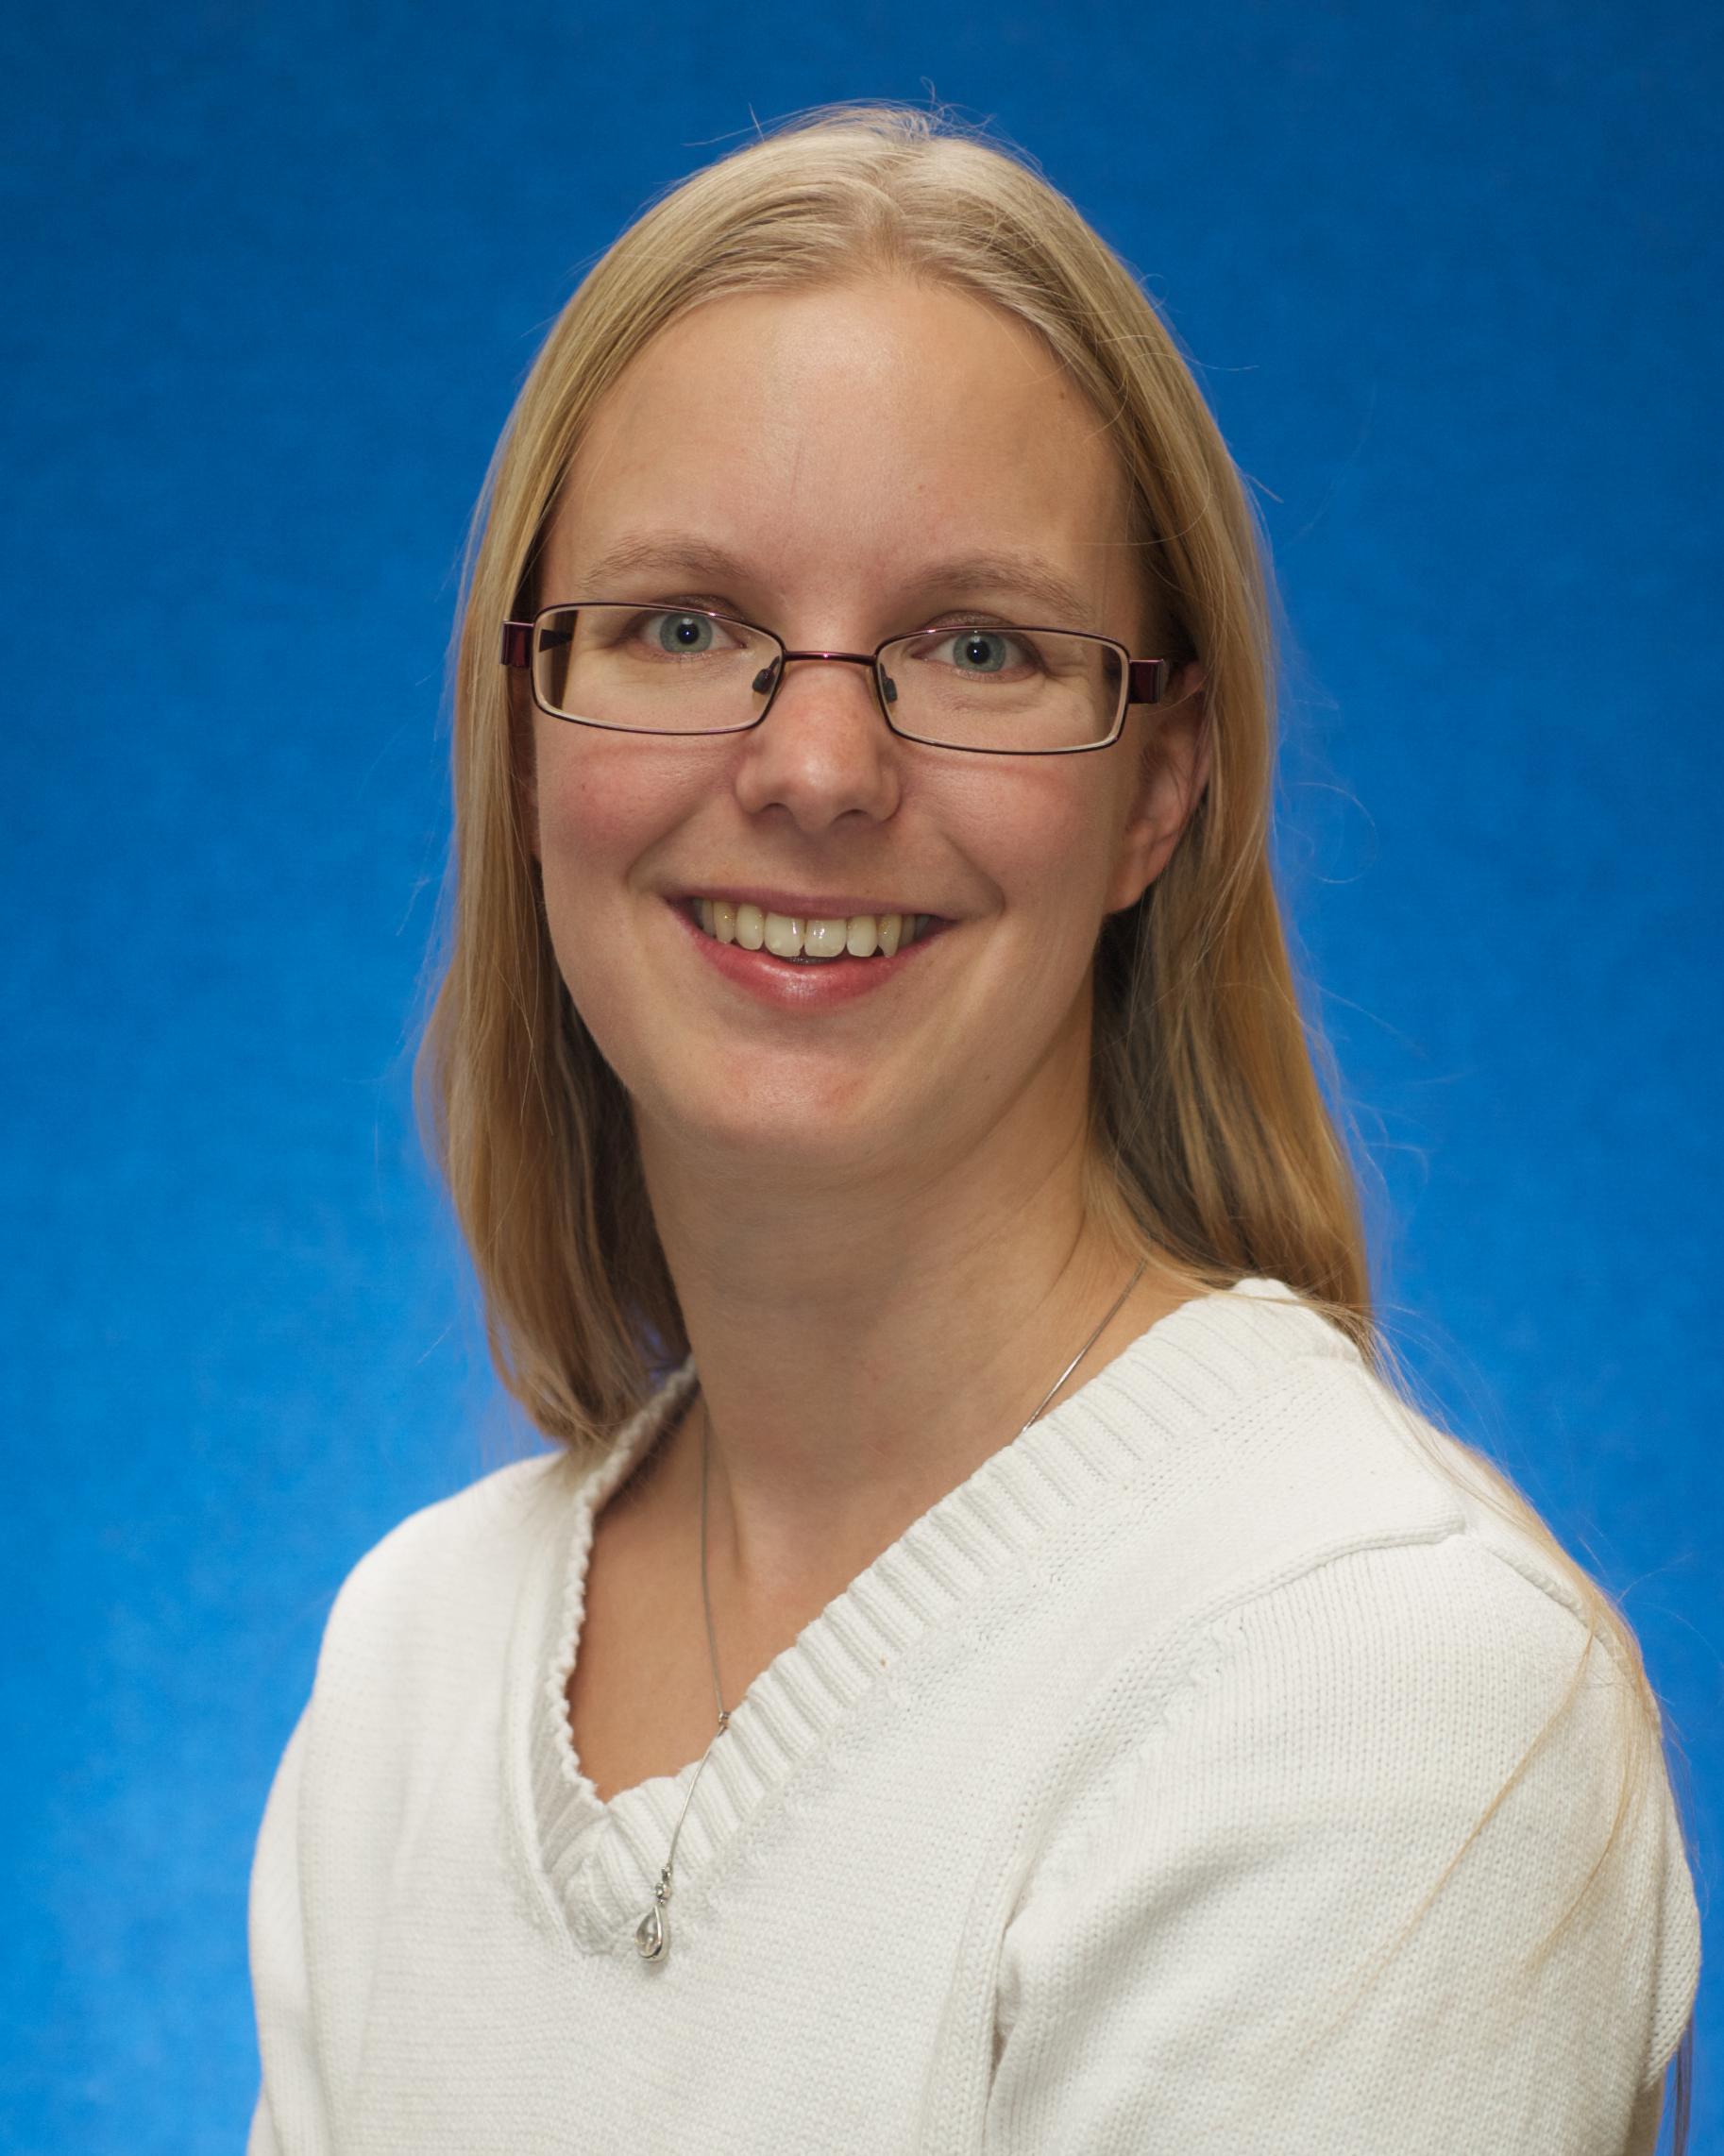 Dr Lara Warmelink